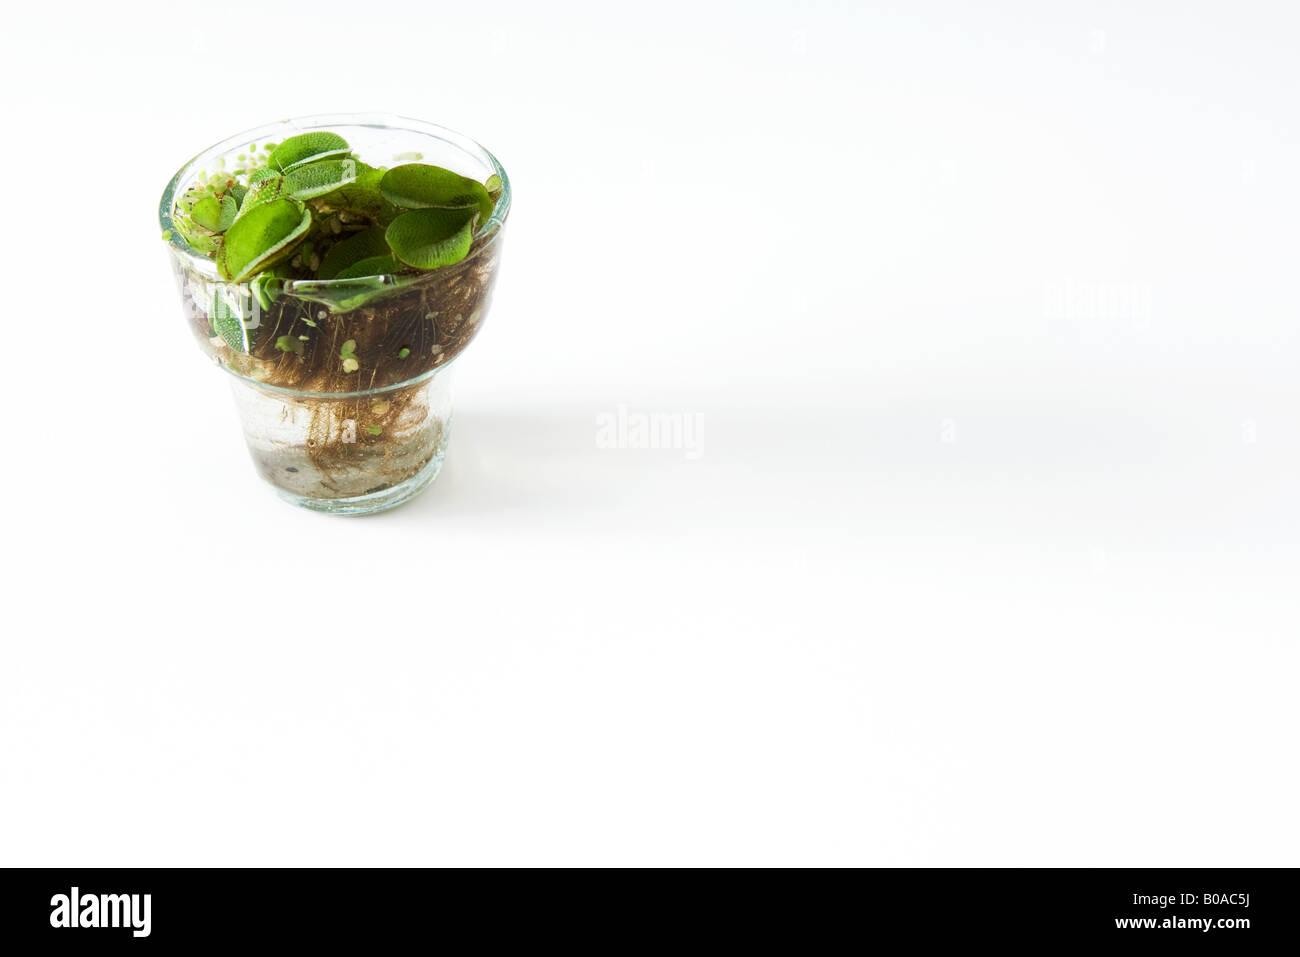 pflanze w chst in glas wasser stockfoto bild 17439454 alamy. Black Bedroom Furniture Sets. Home Design Ideas